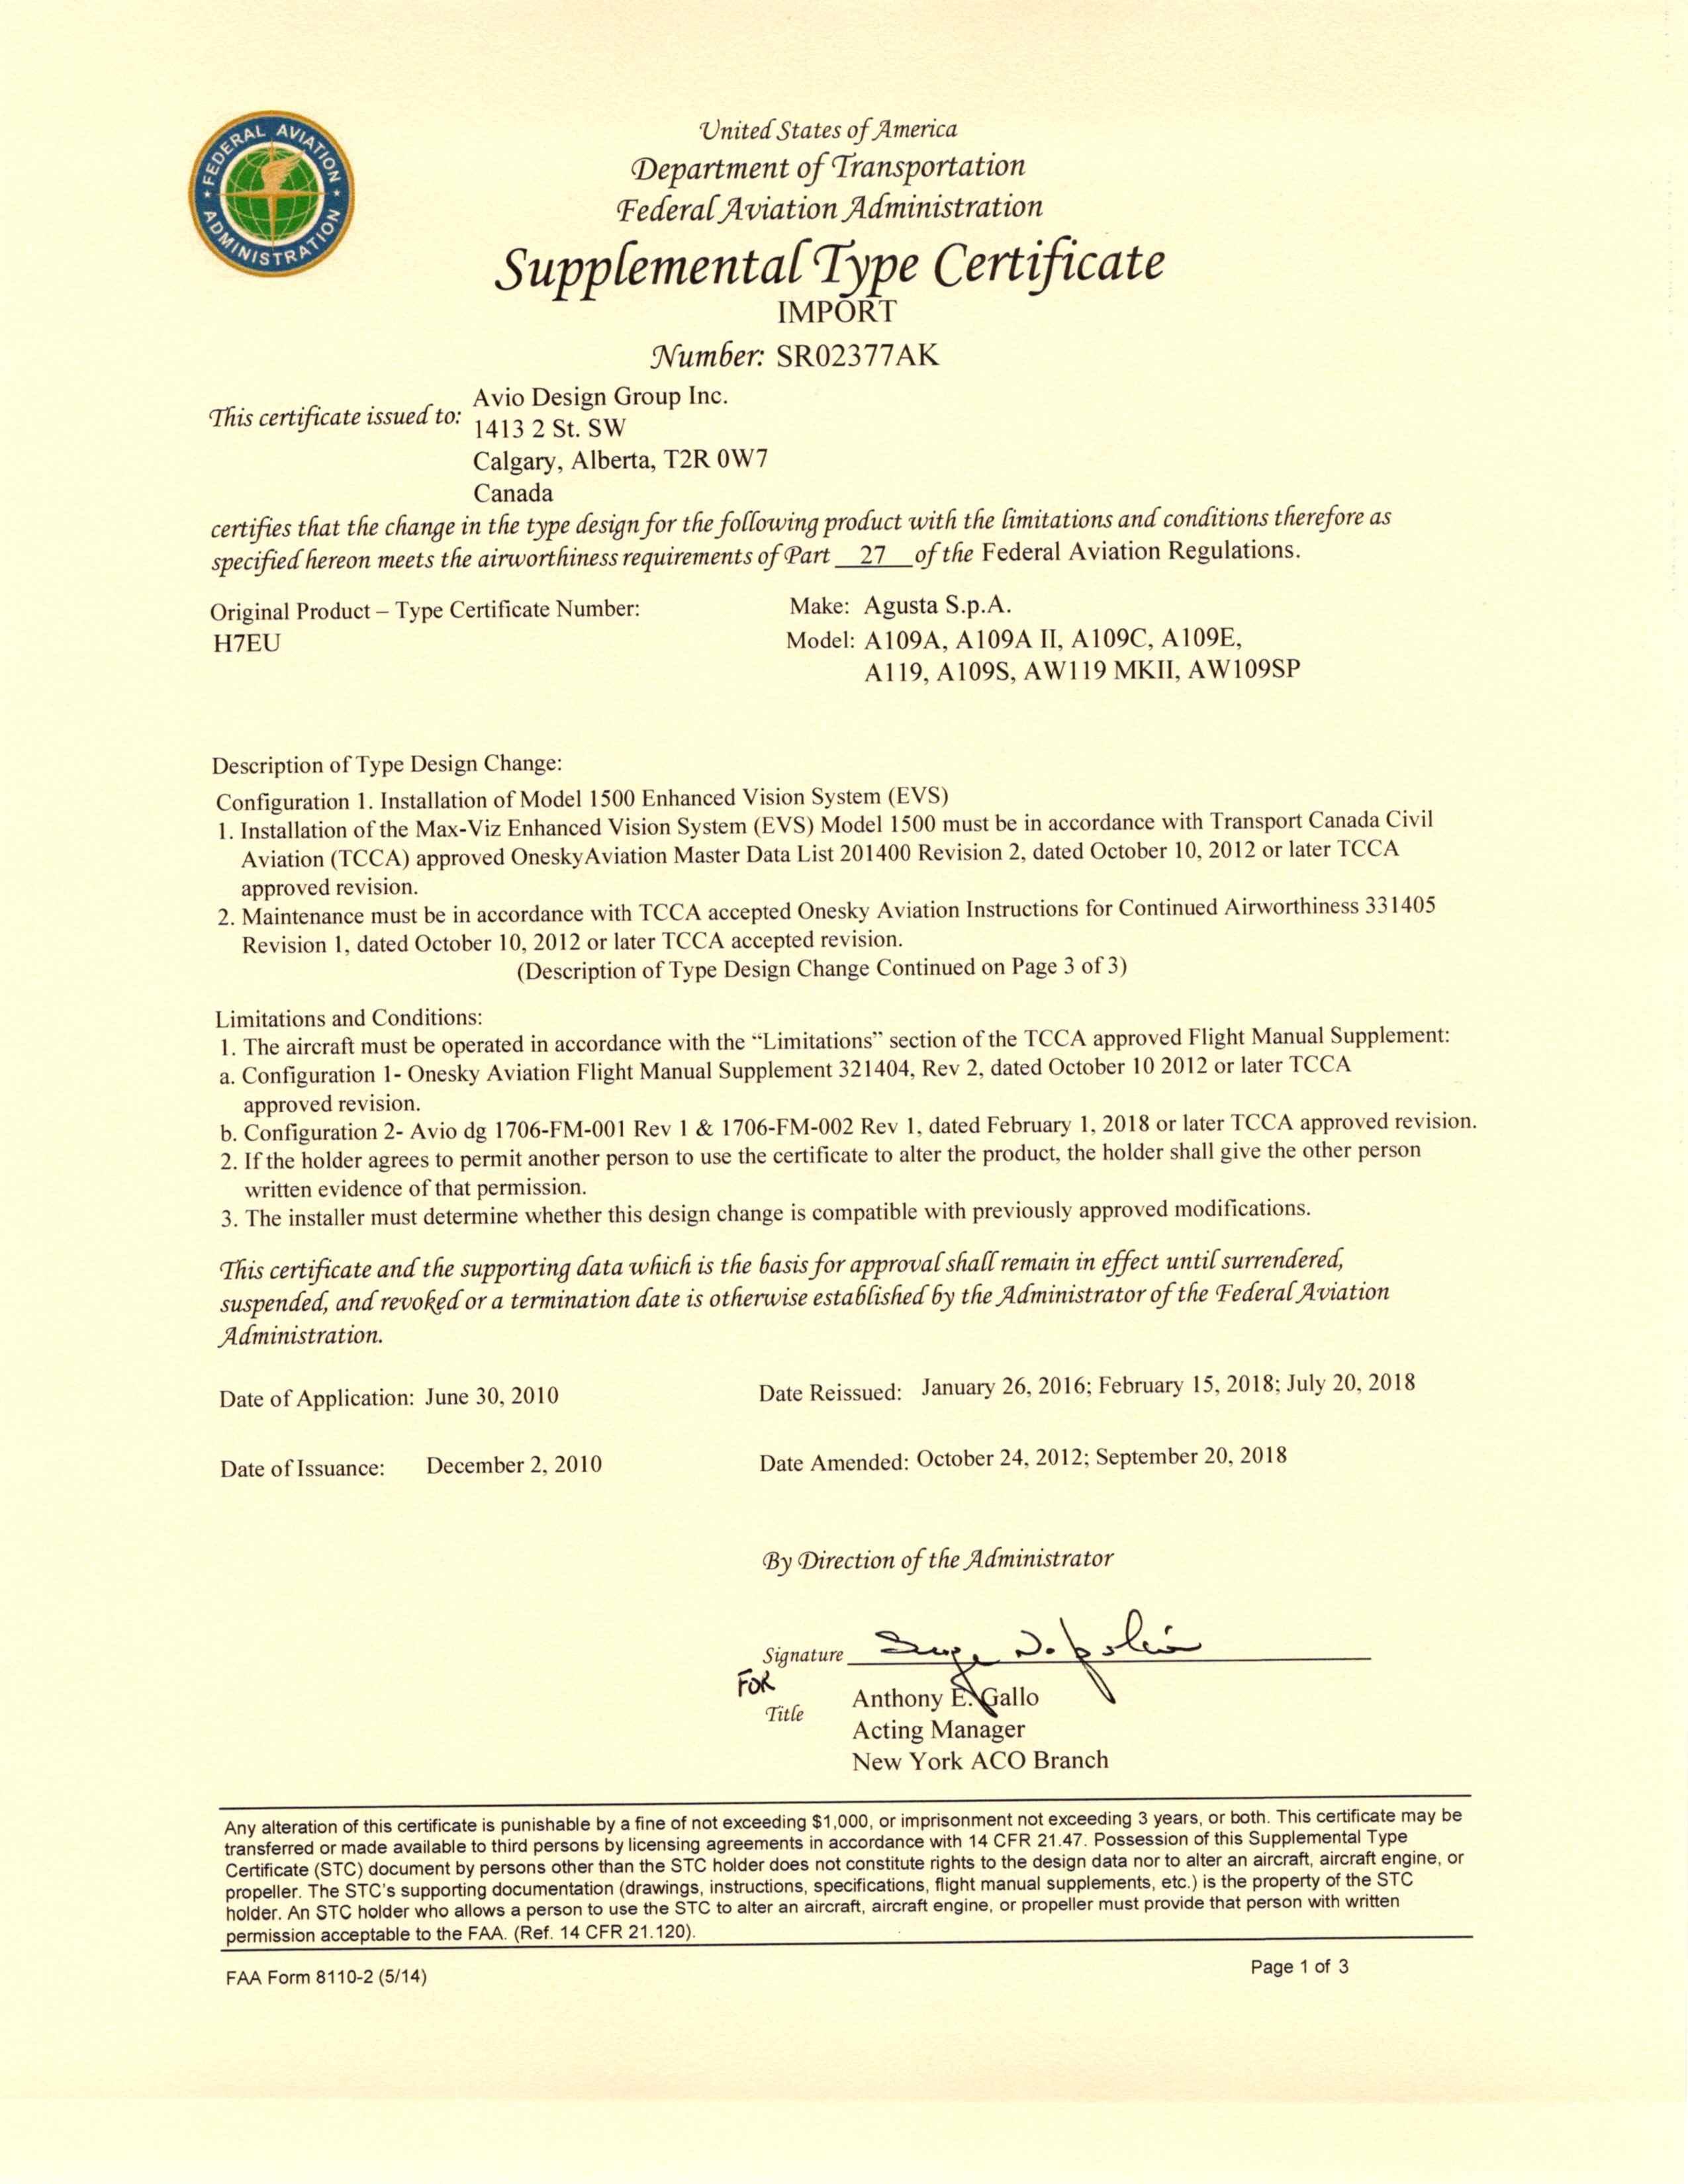 Avio design group image of Certificate FAA STC SR02377AK_Page_1